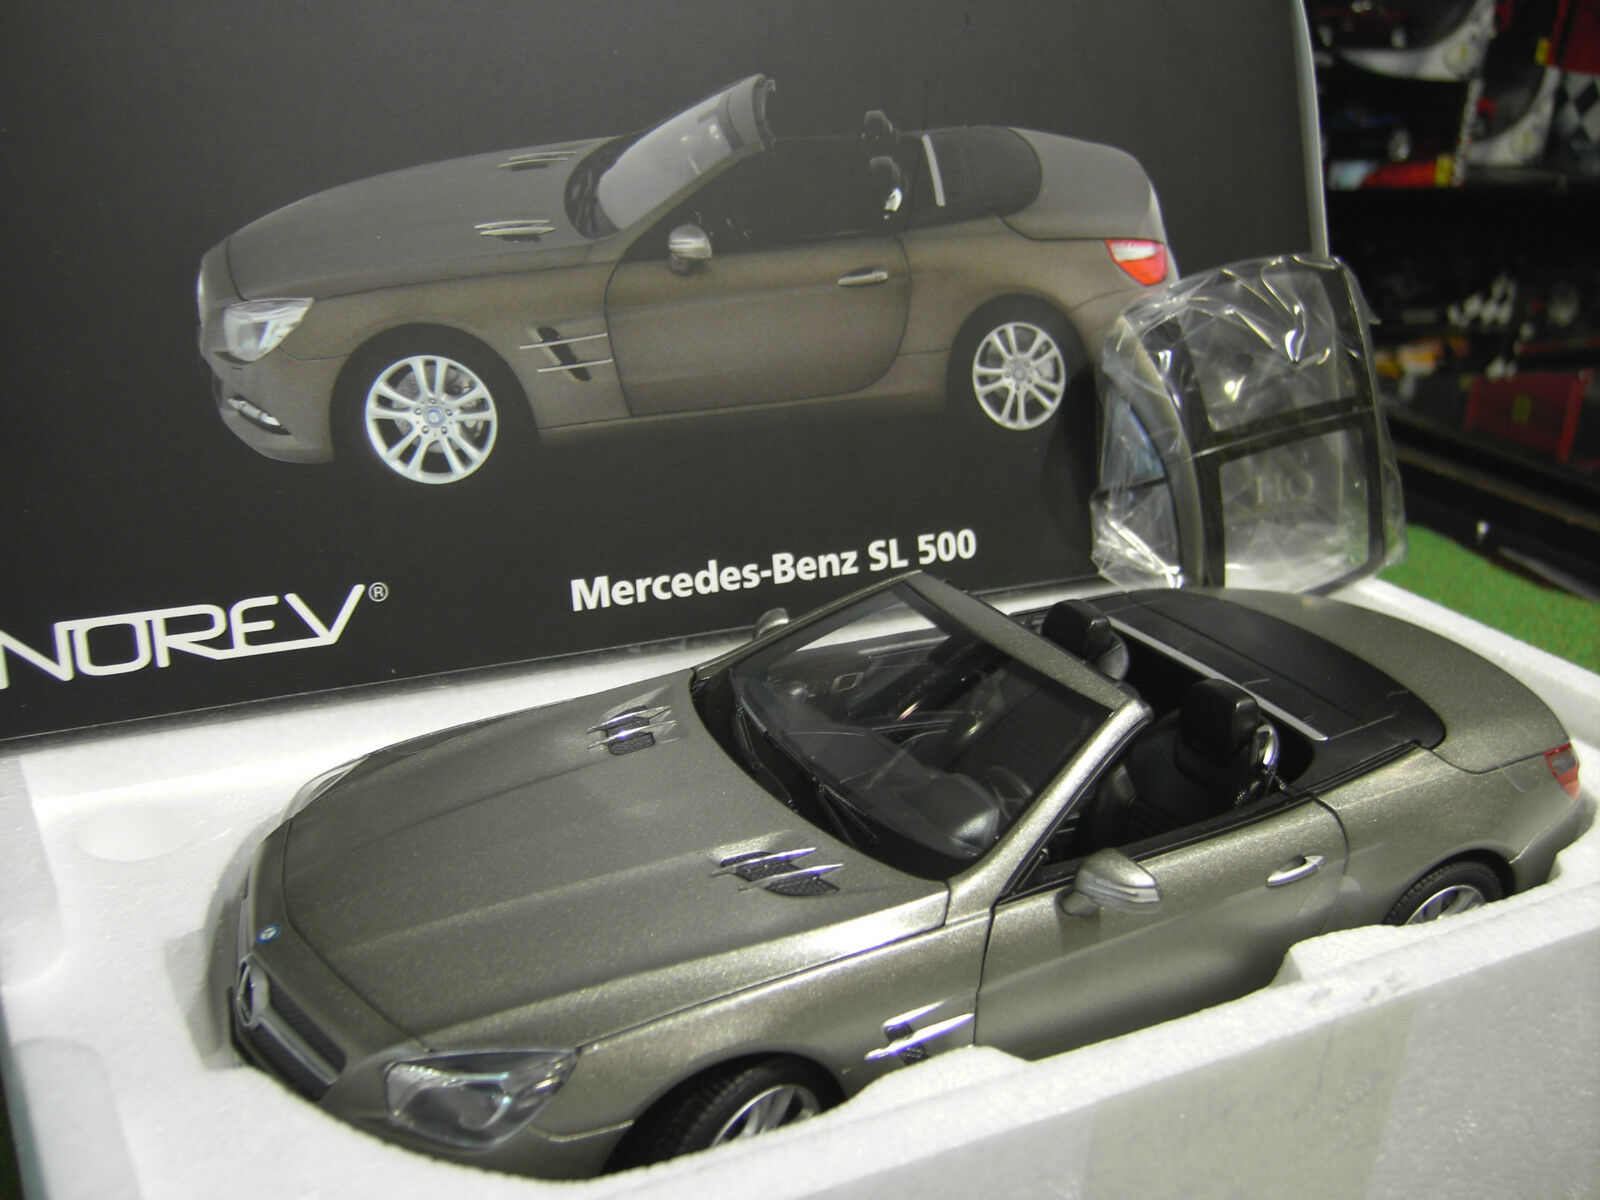 MERCEDES BENZ 2012 SL 500 cabriolet convertible Dark gris matt 1 18 NOREV 183590